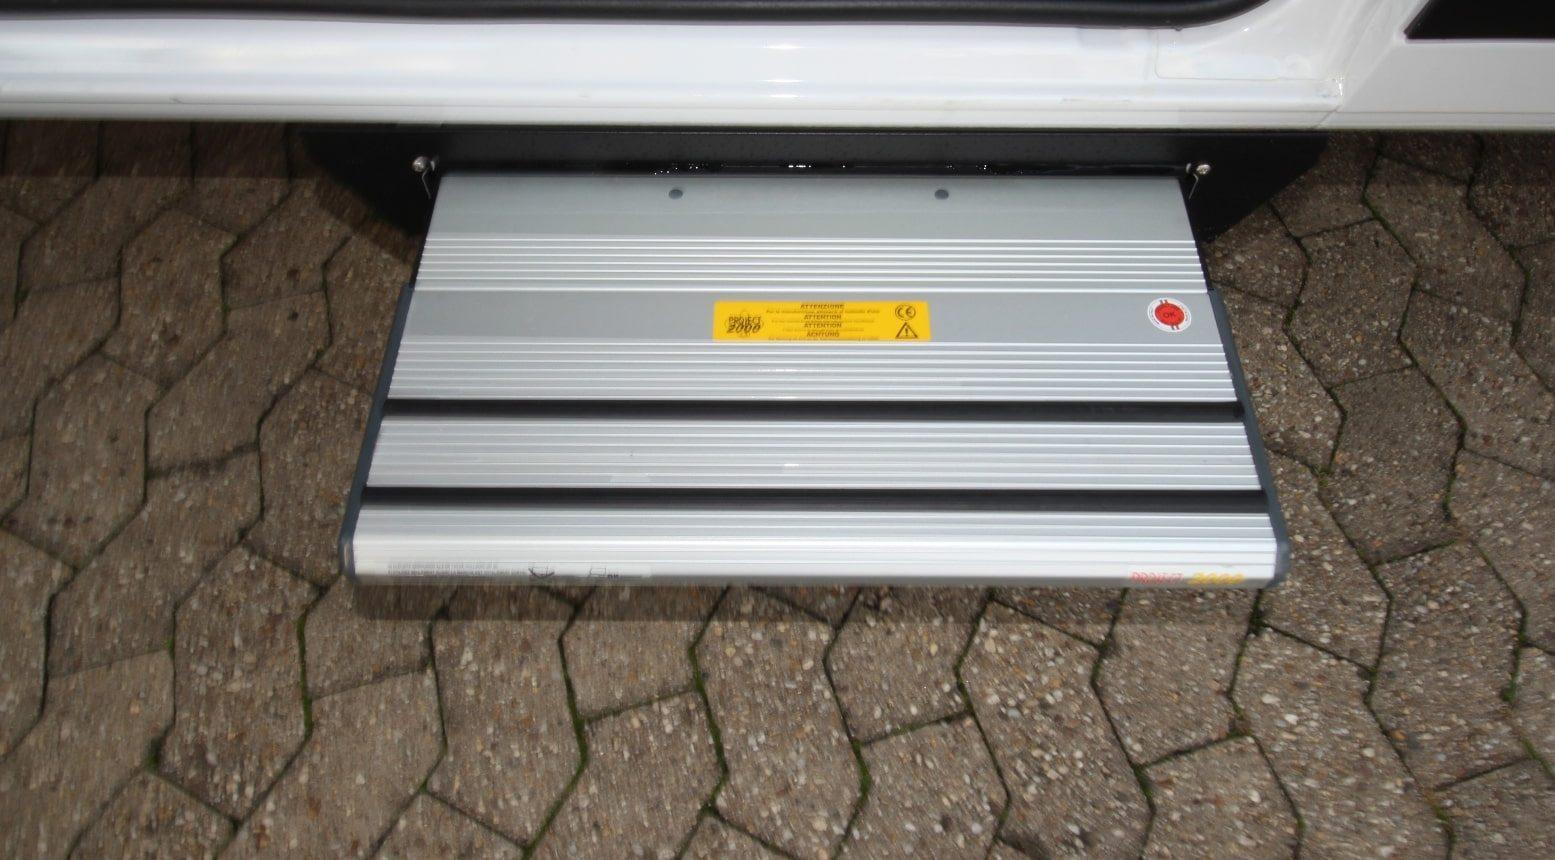 Chausson V697 Twist mieten